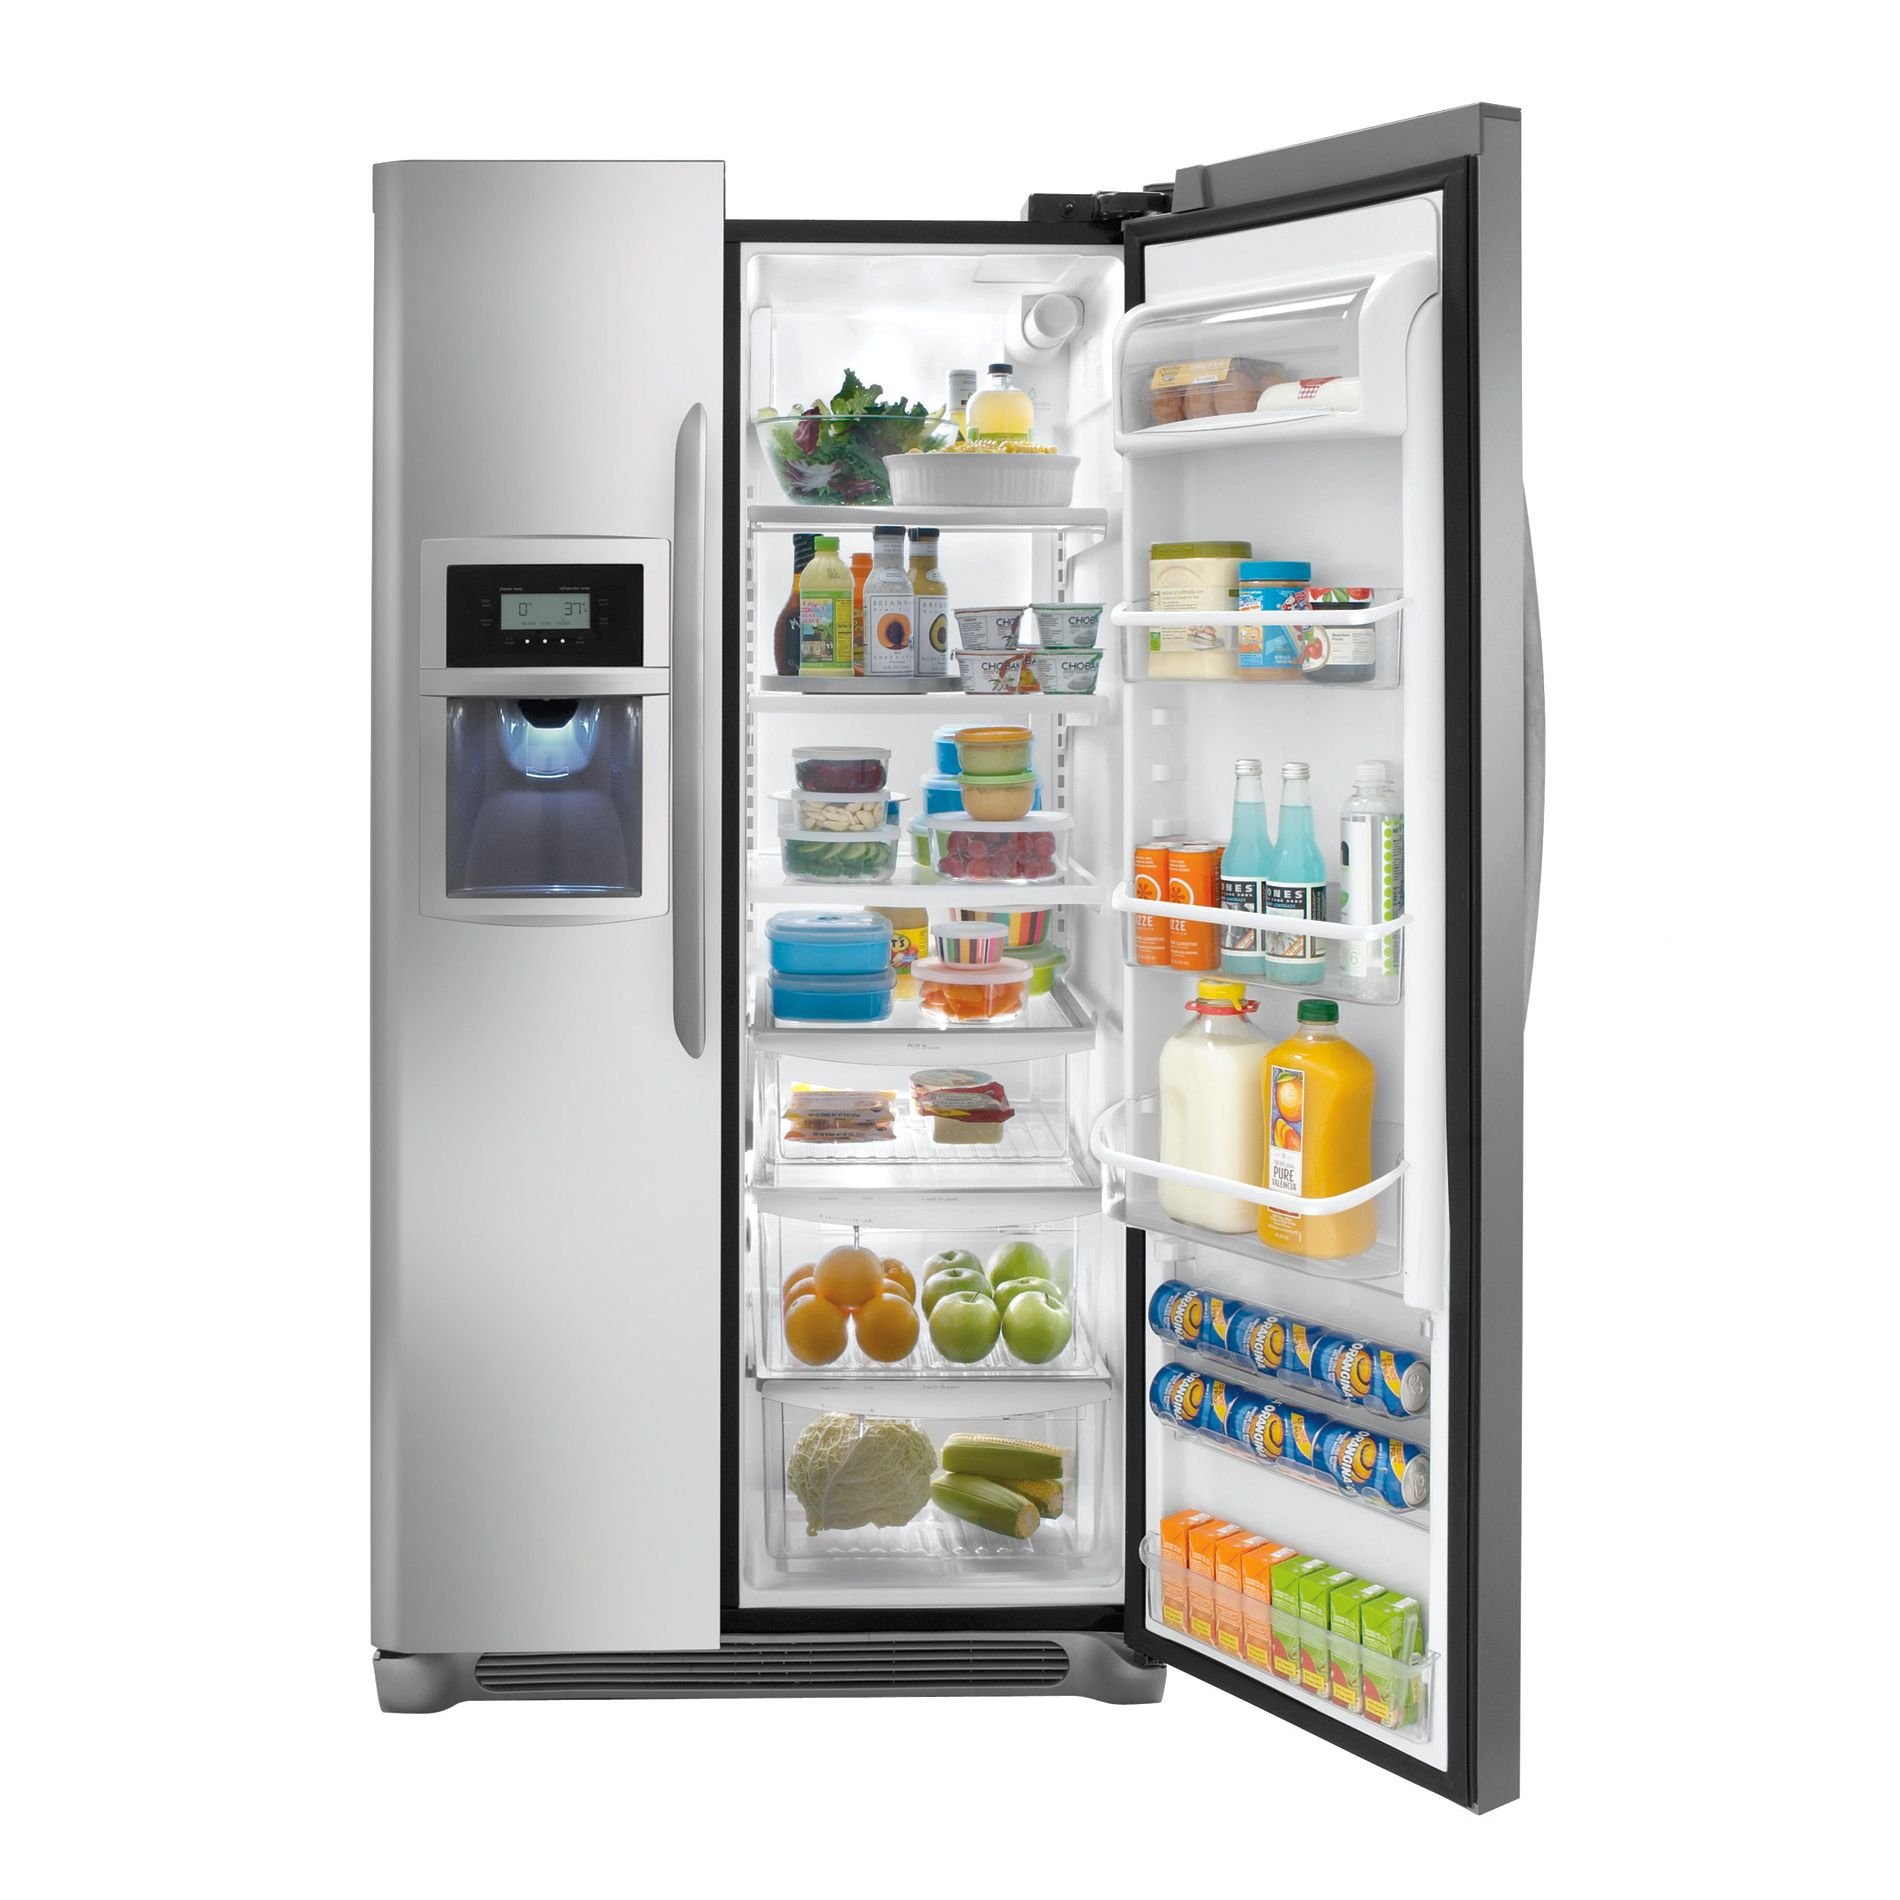 Frigidaire Gallery 22.6 cu. ft. Side-by-Side Refrigerator